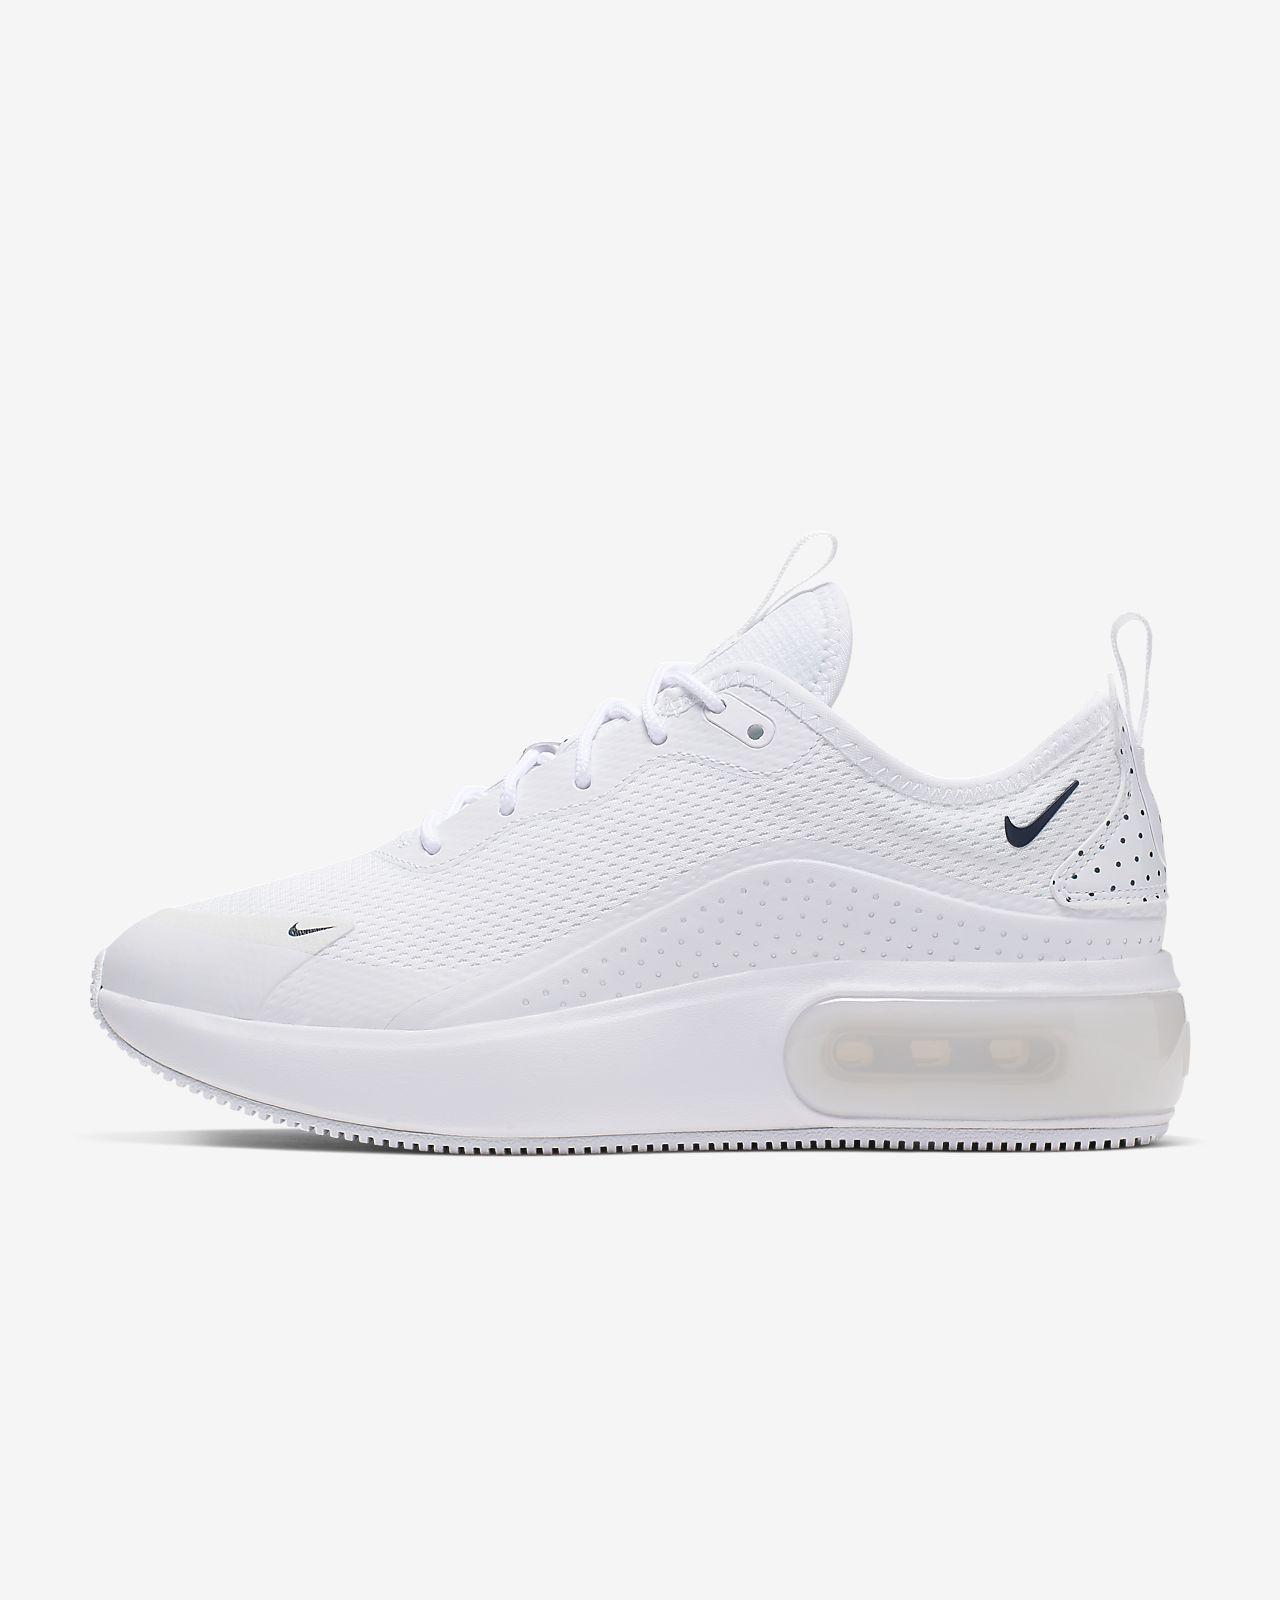 Sko Nike Air Max Dia SE Unité Totale för kvinnor